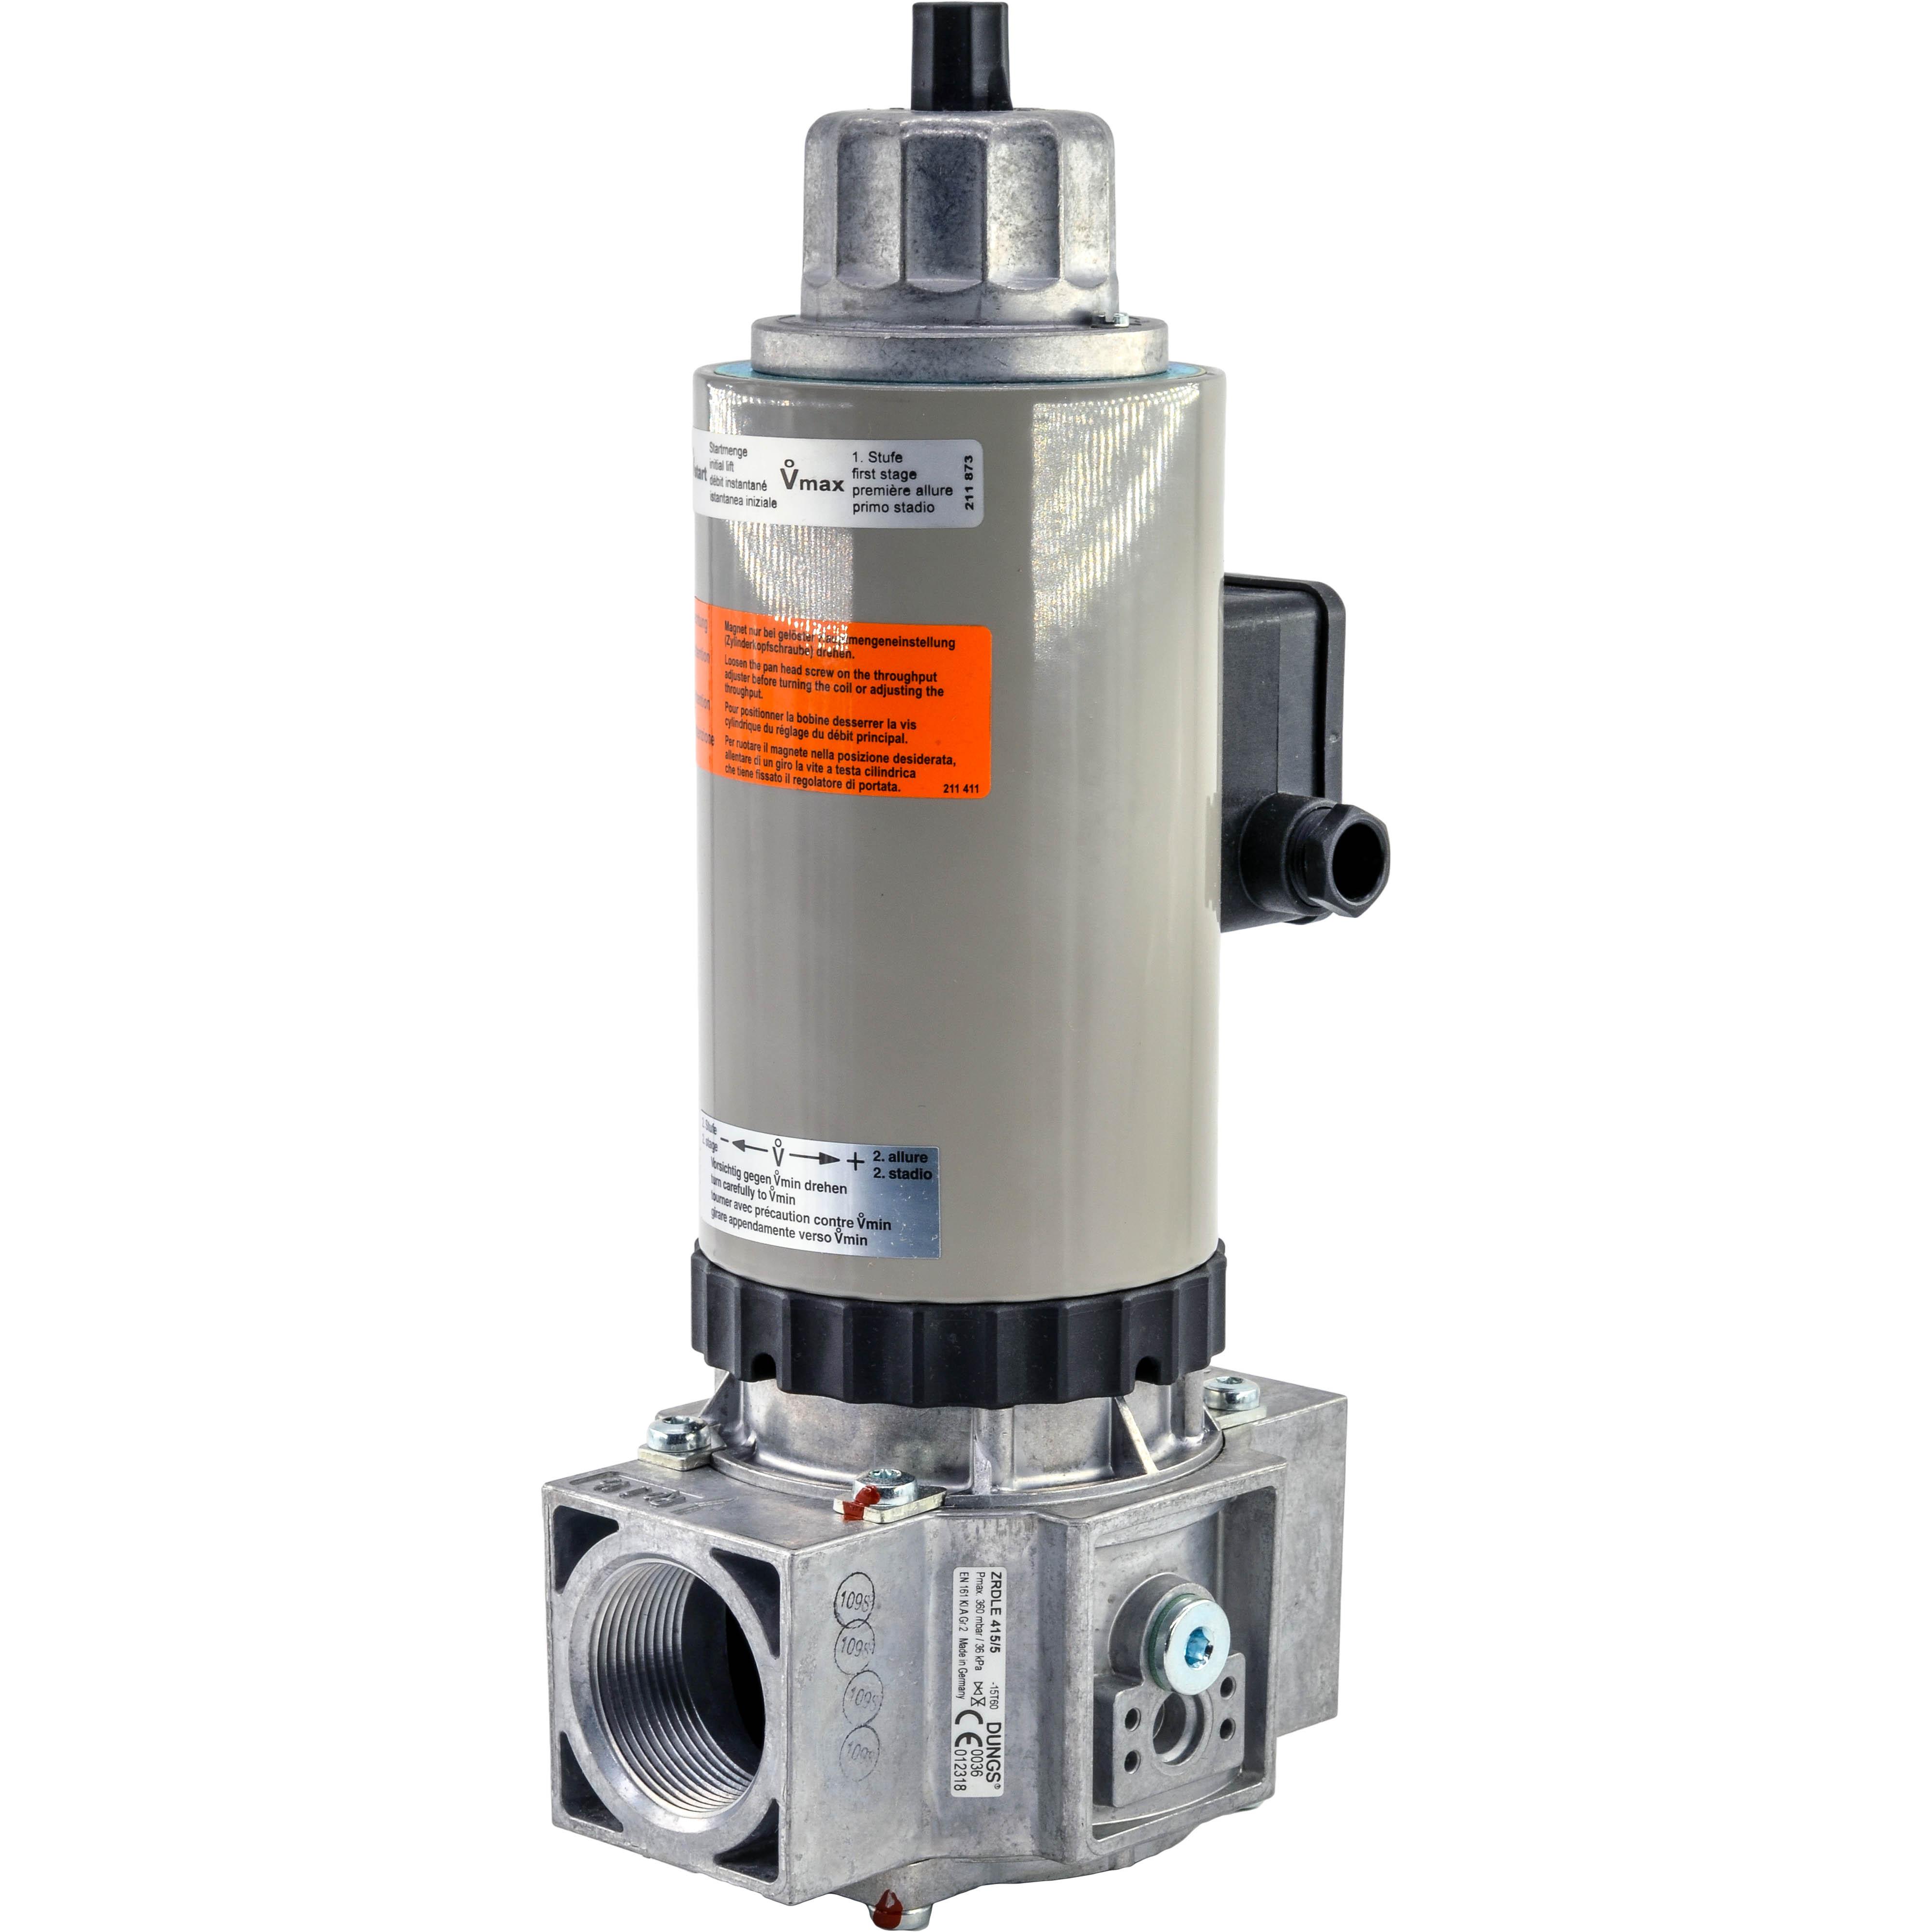 Электромагнитный клапан ZRD 410/5 DUNGS цена, купить